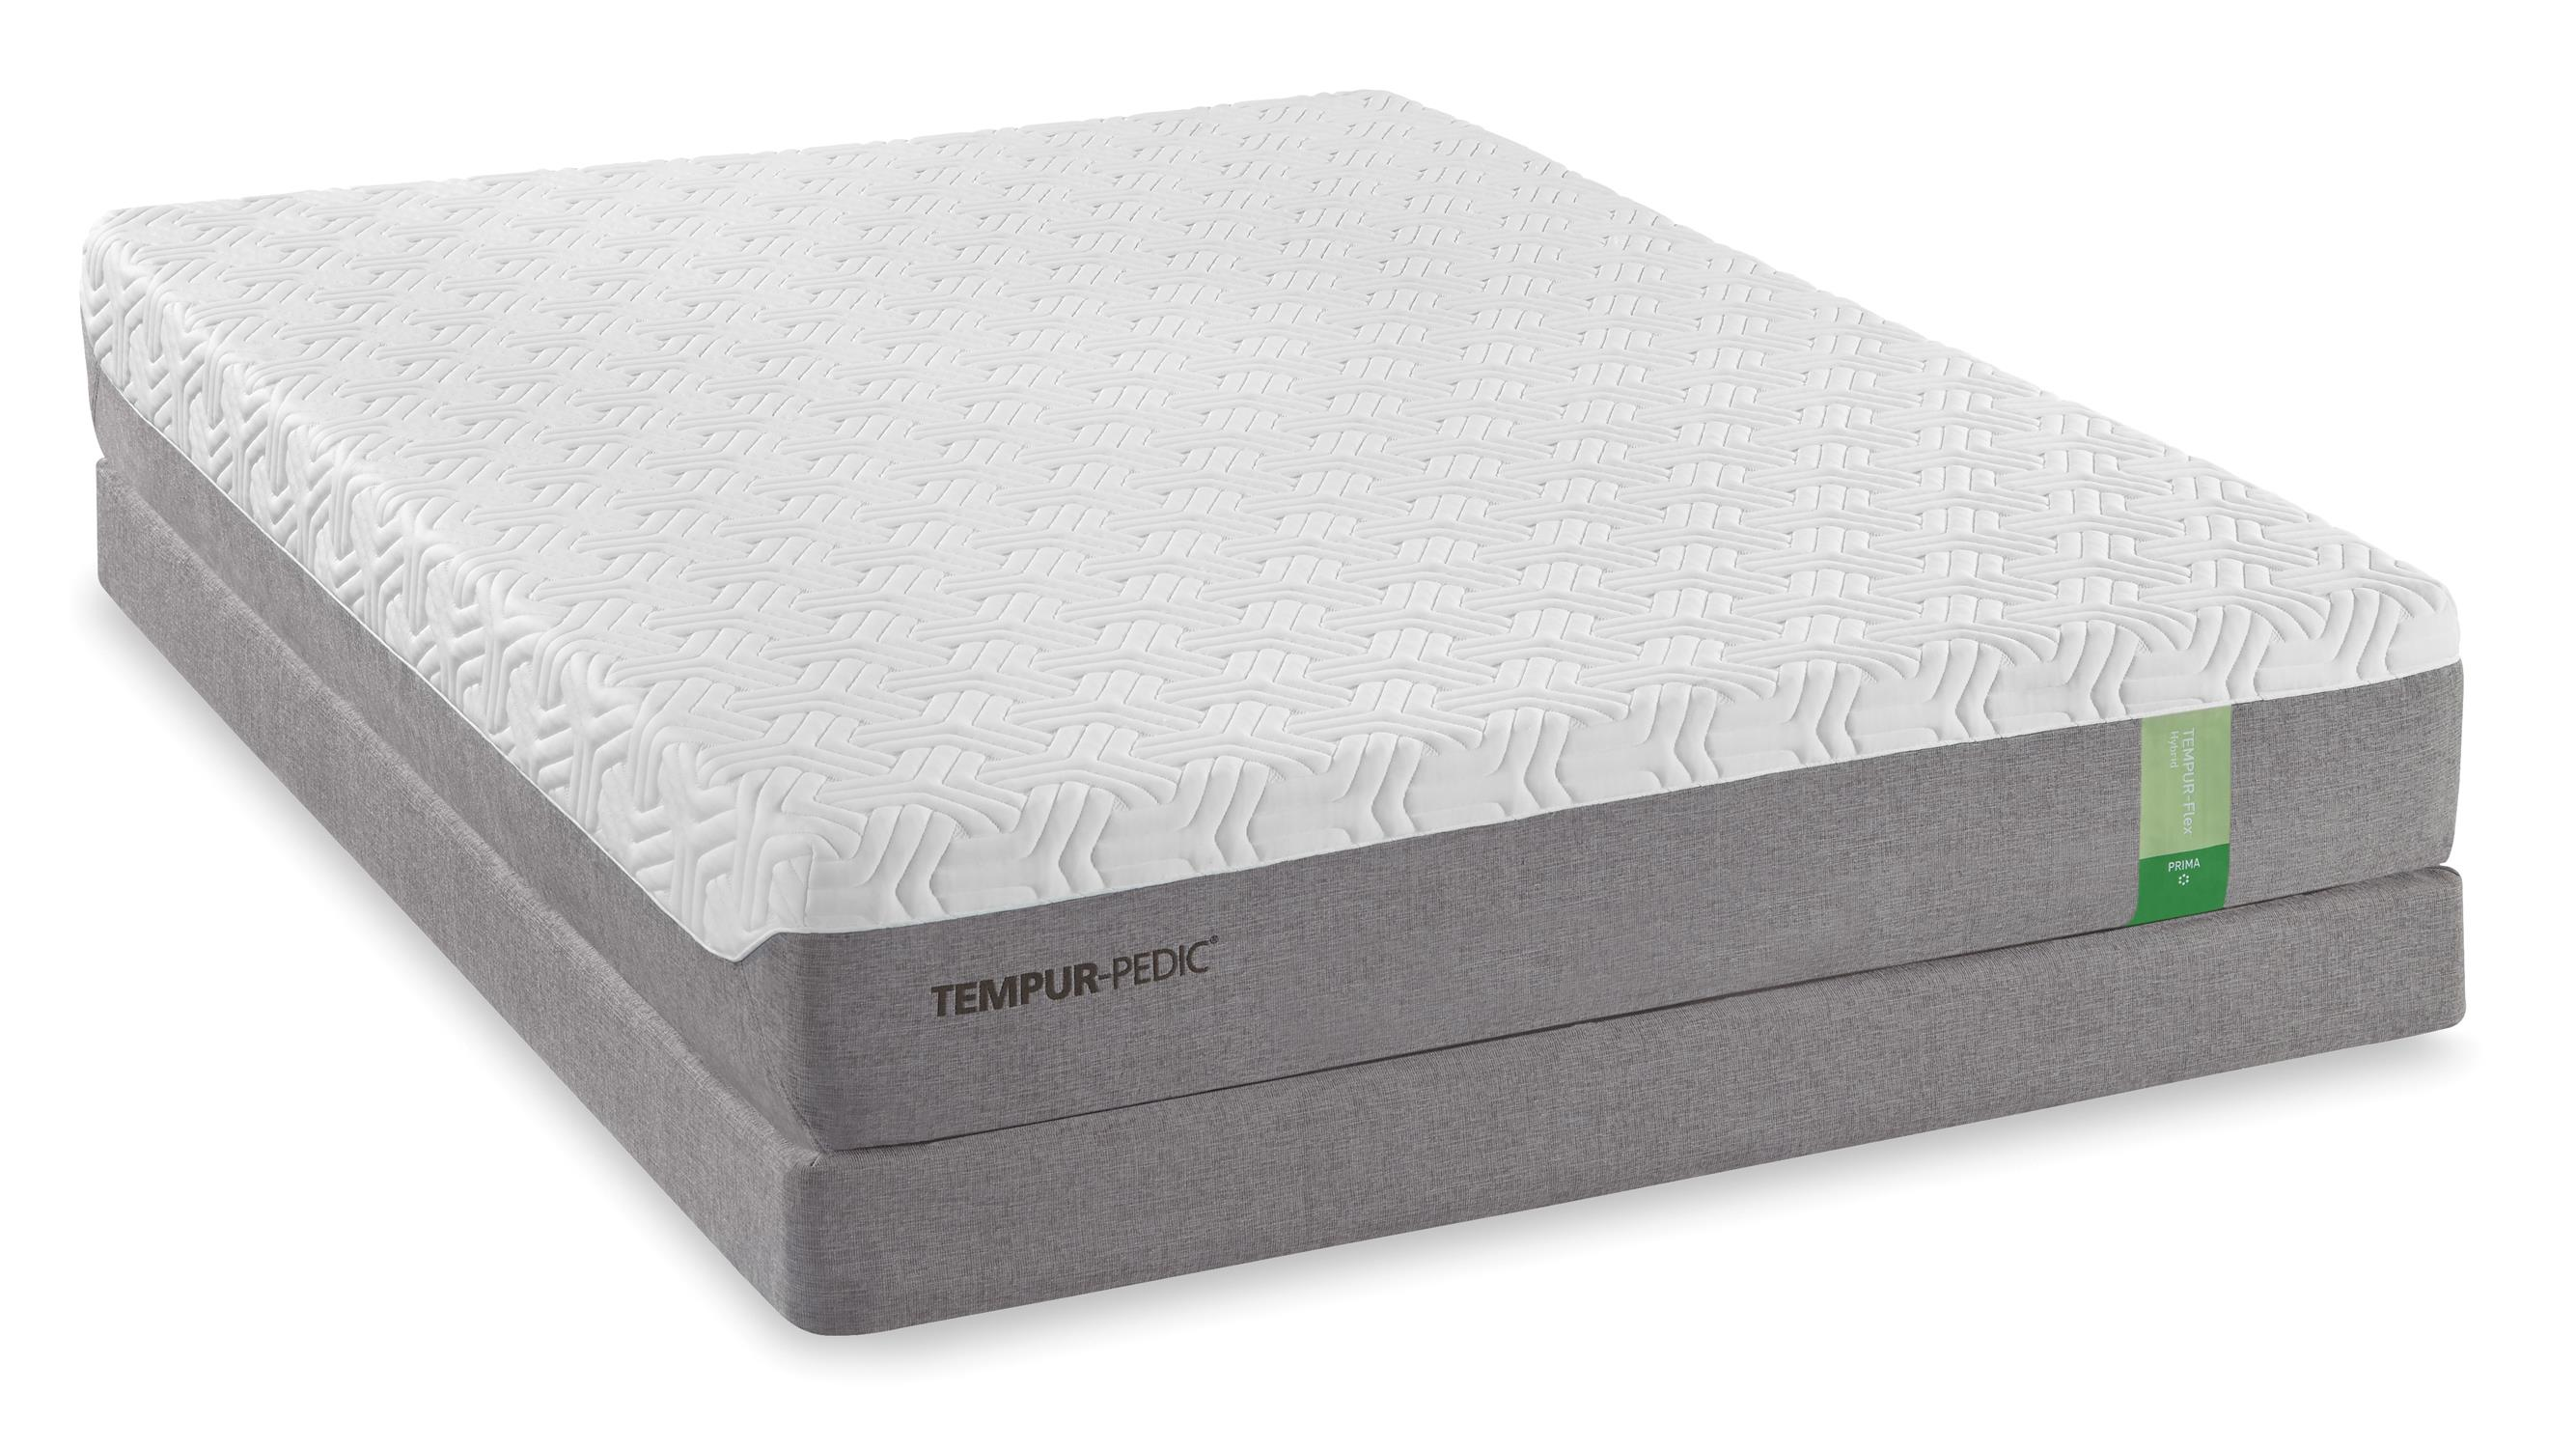 Tempur-Pedic® TEMPUR-Flex Prima Twin Extra Long Medium Firm Mattress Set - Item Number: 10115220+20510120